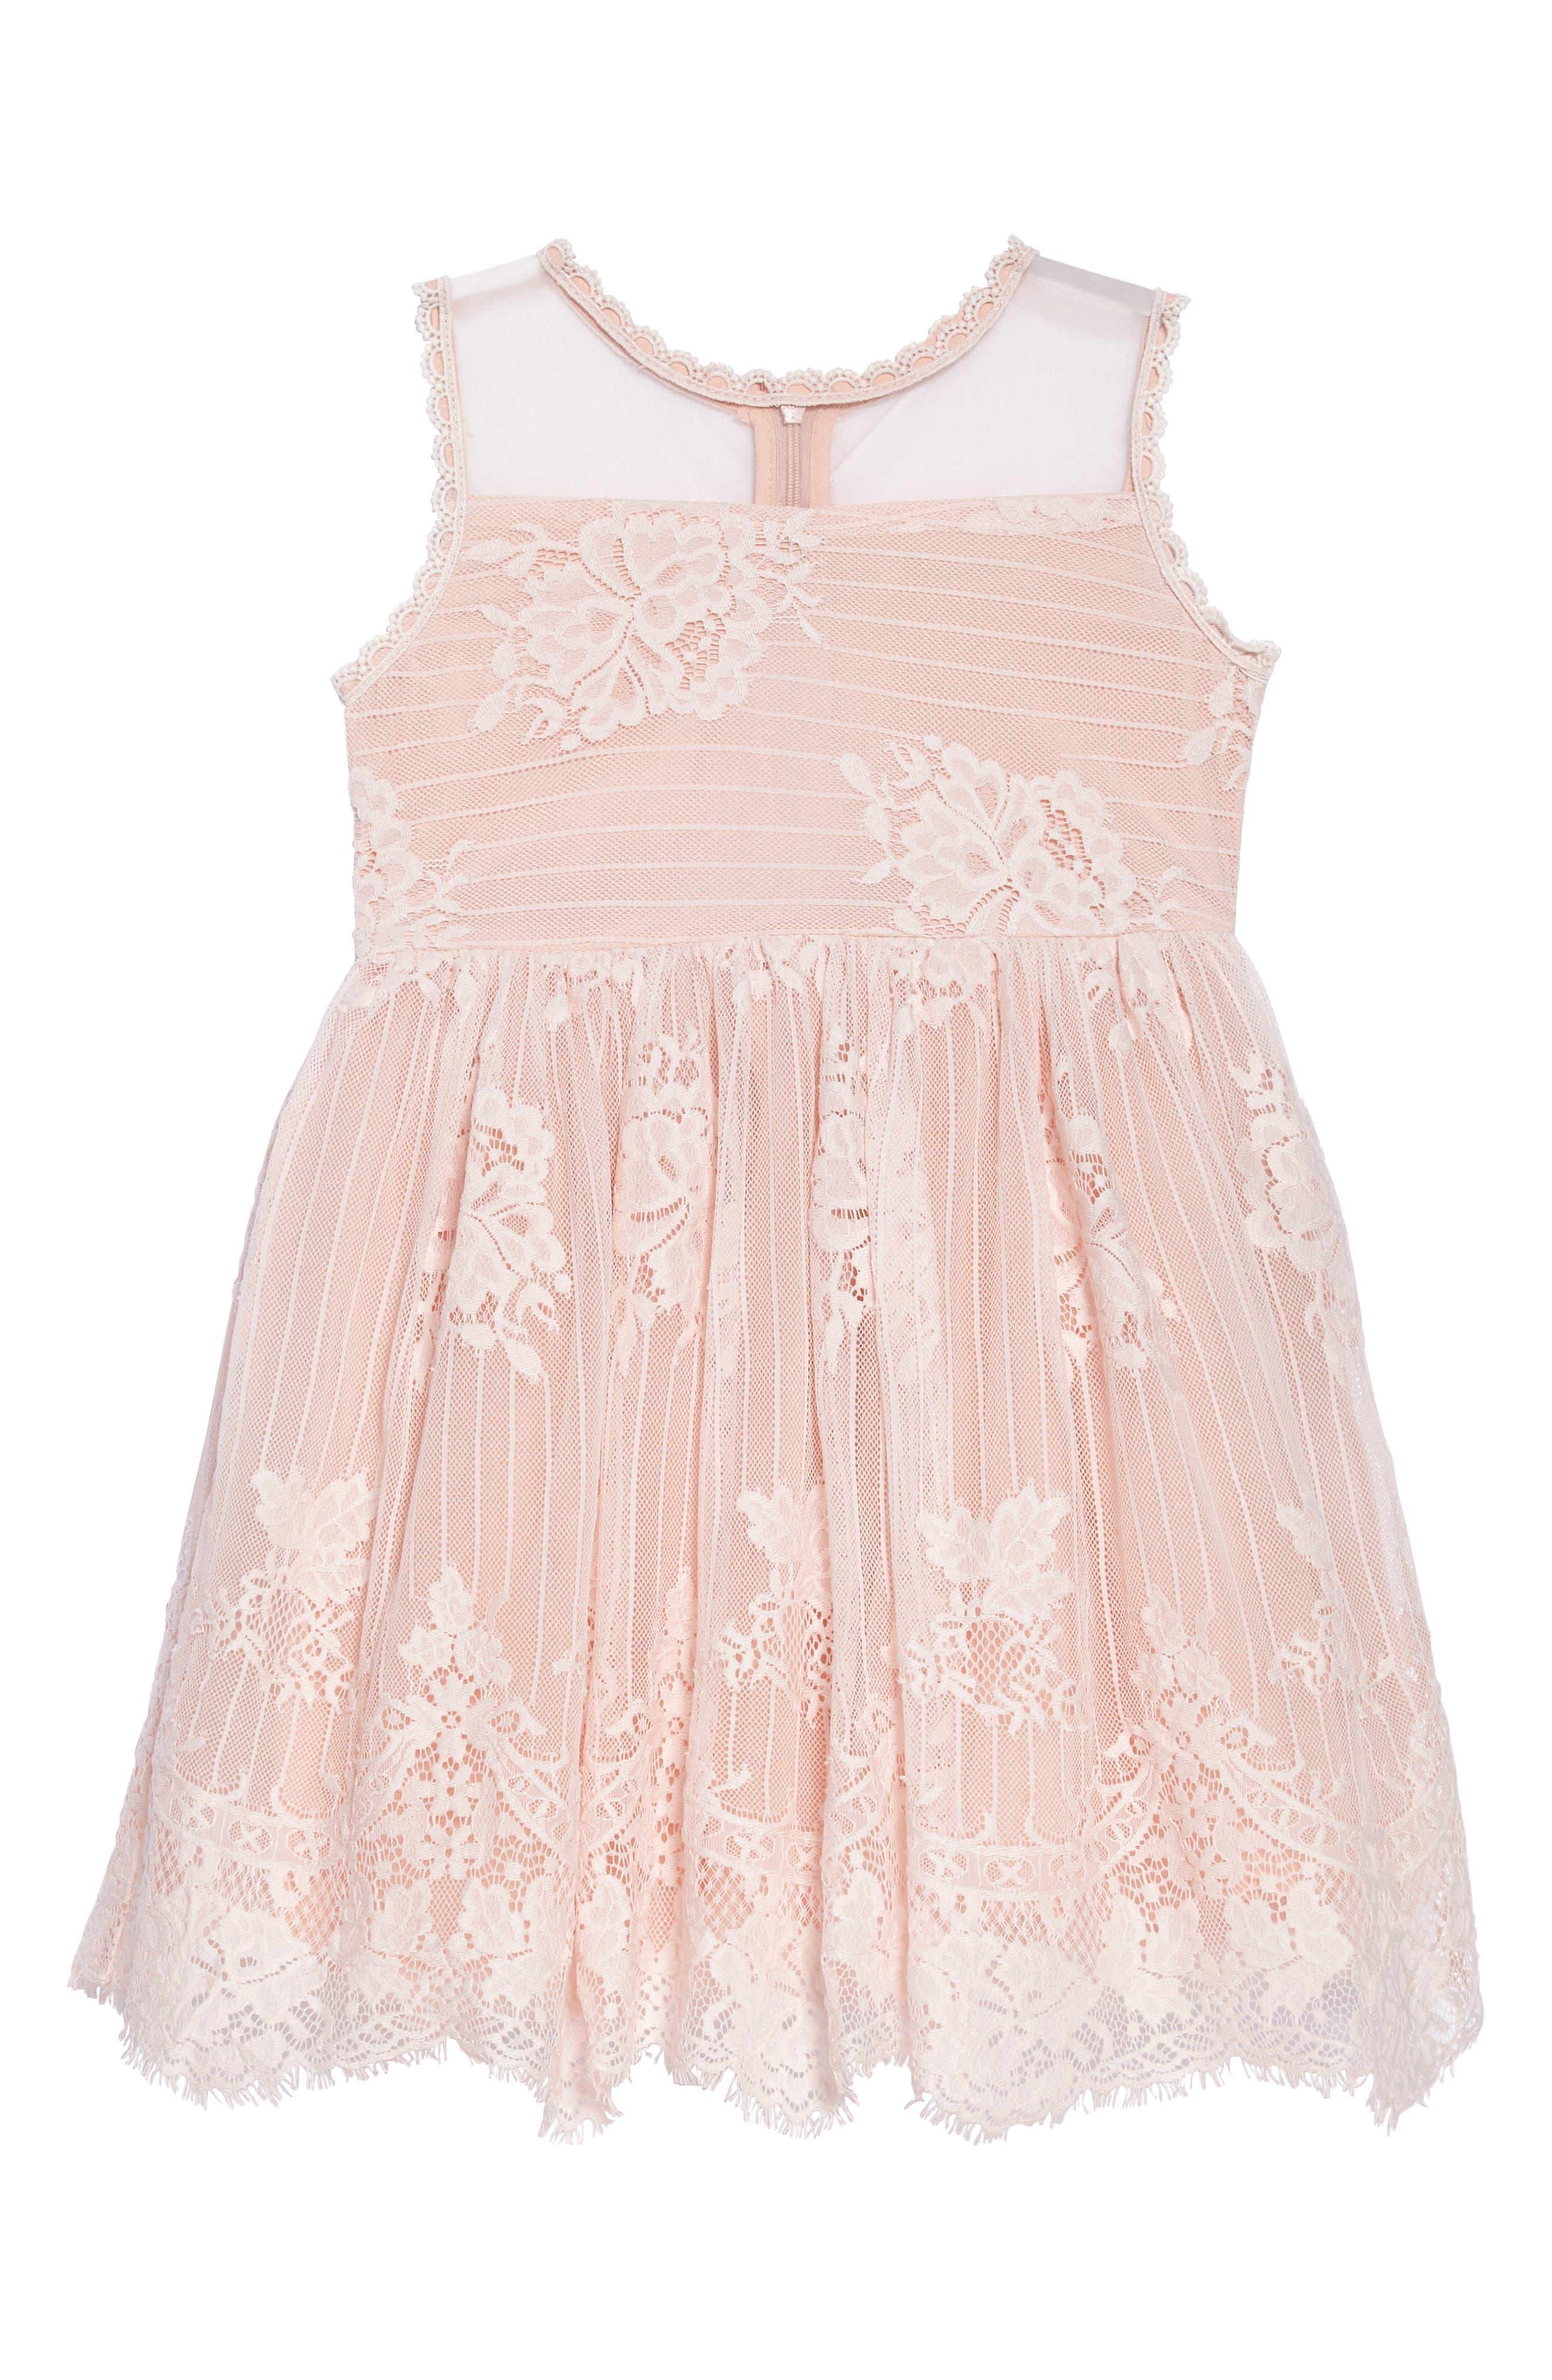 Lace Fit & Flare Dress,                             Main thumbnail 1, color,                             650